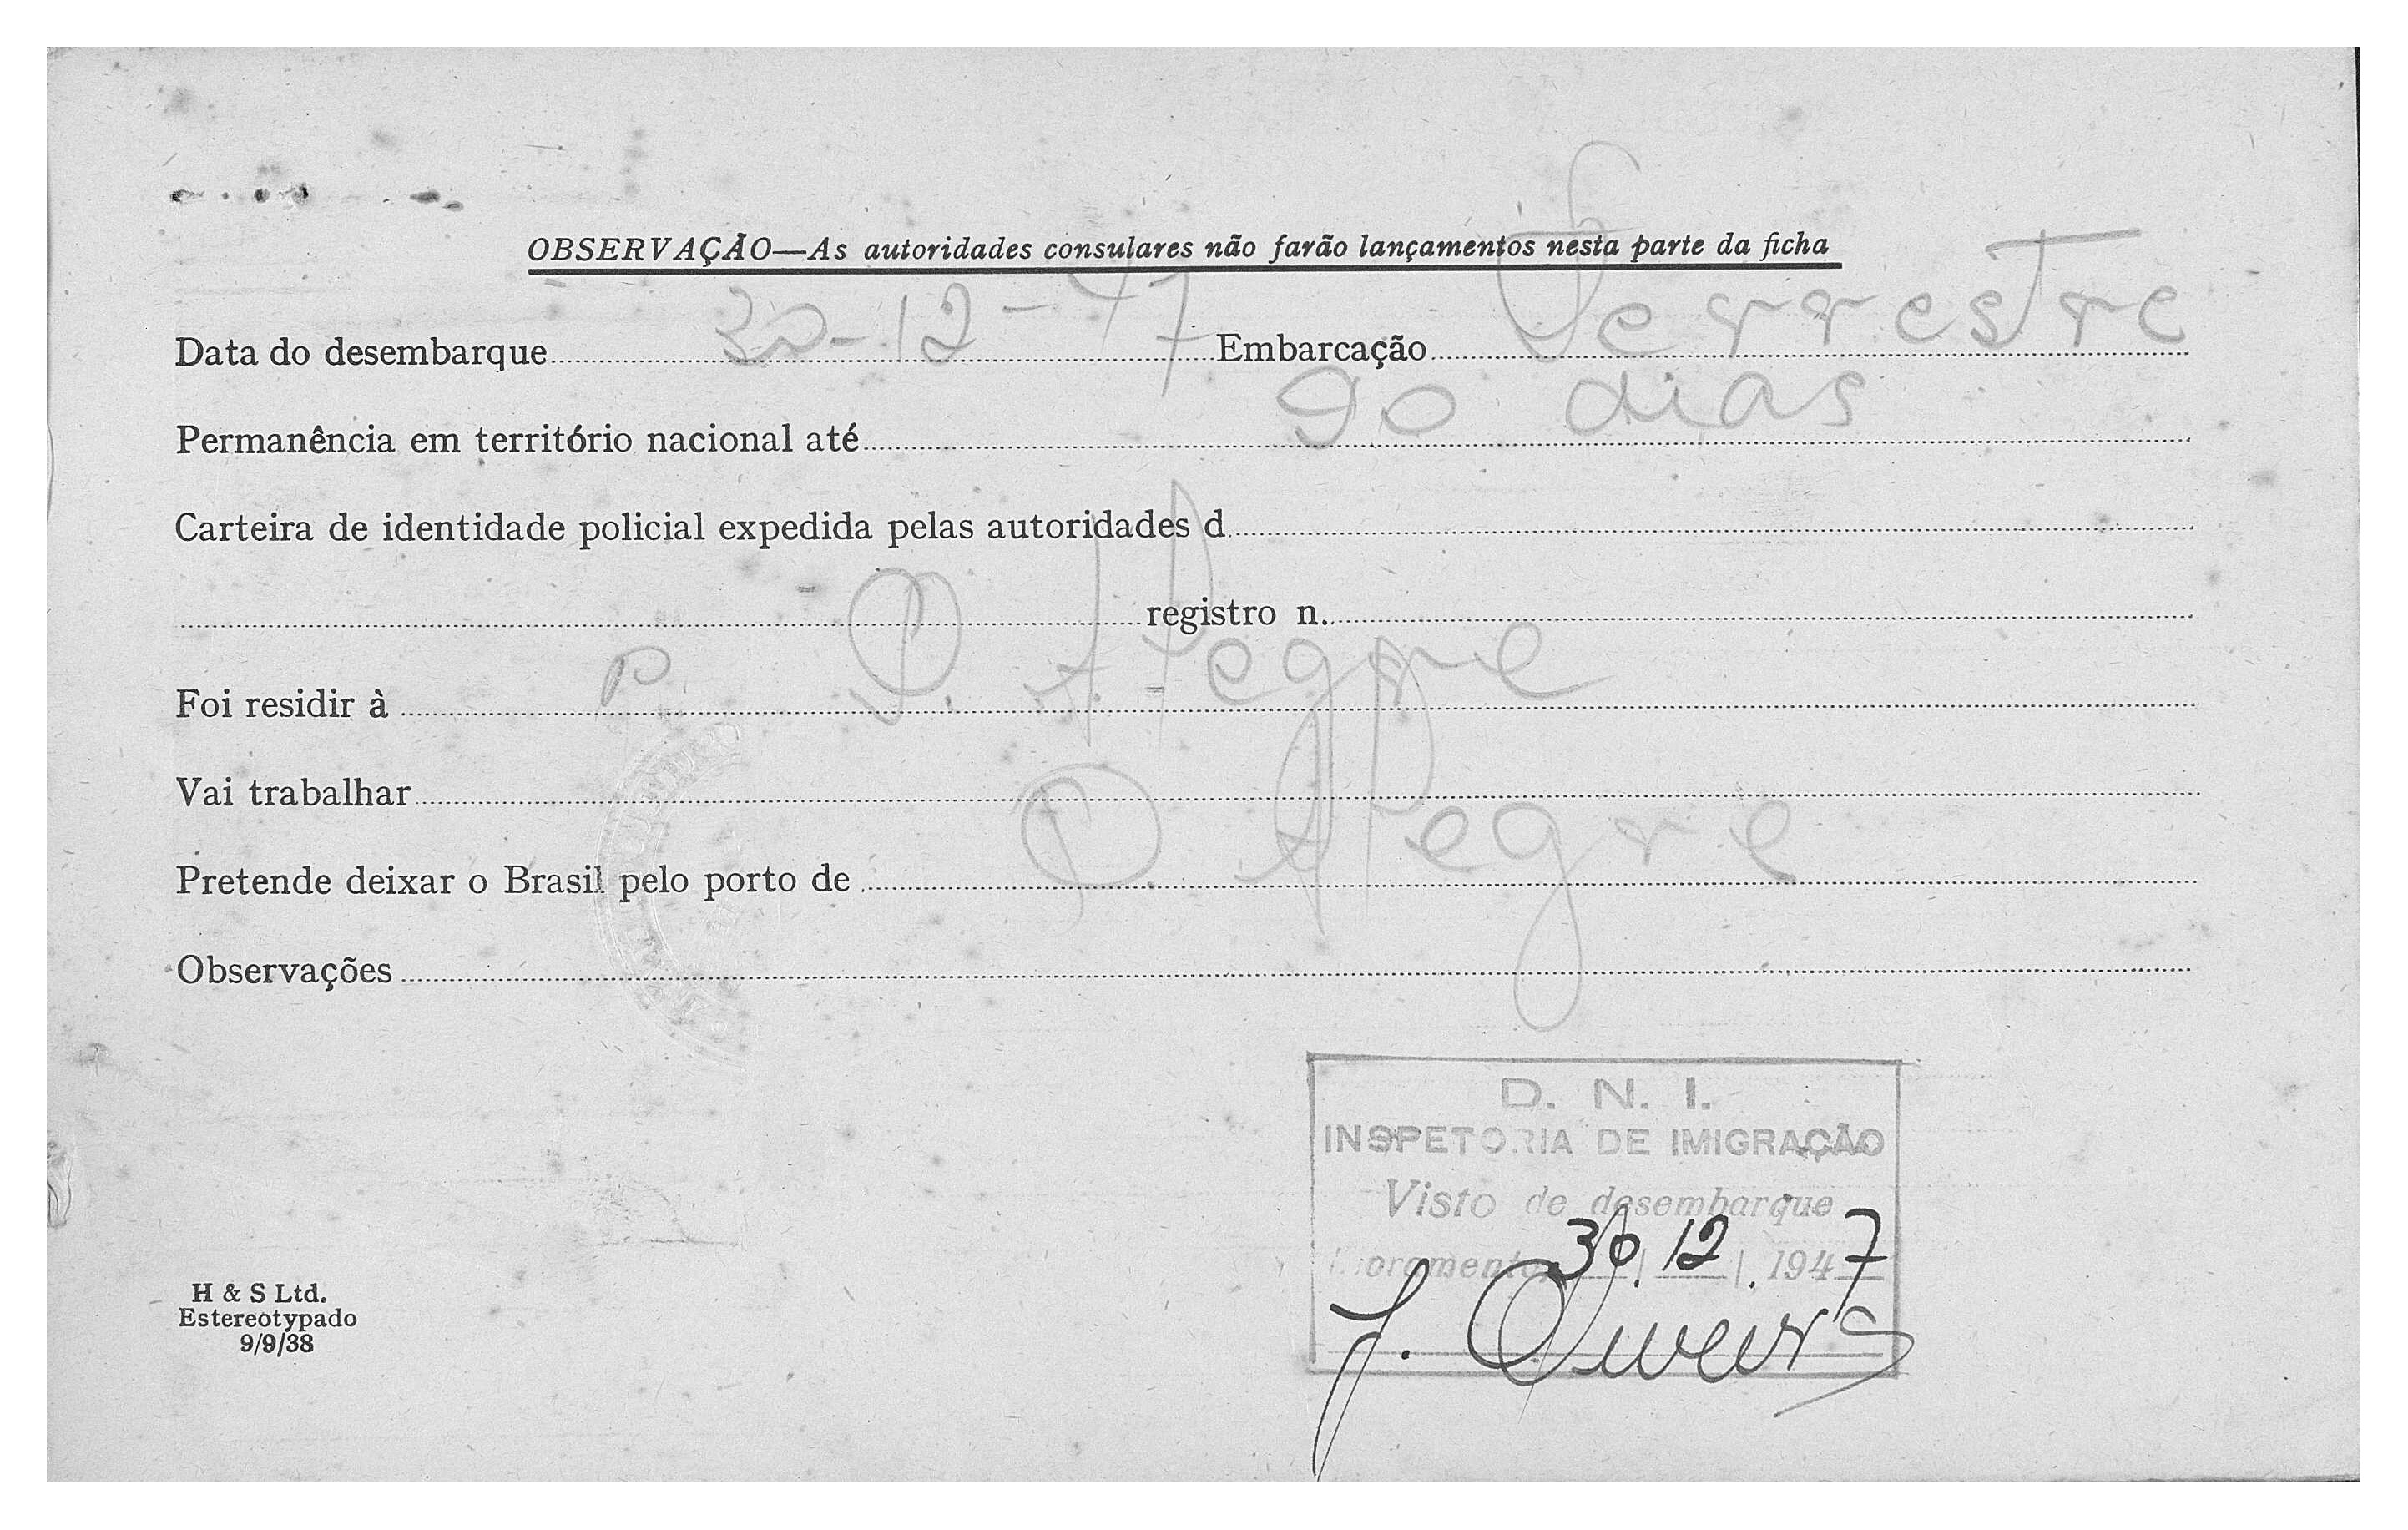 Sixto-1947-12-ficha-consular-RJ-02-copy.jpg